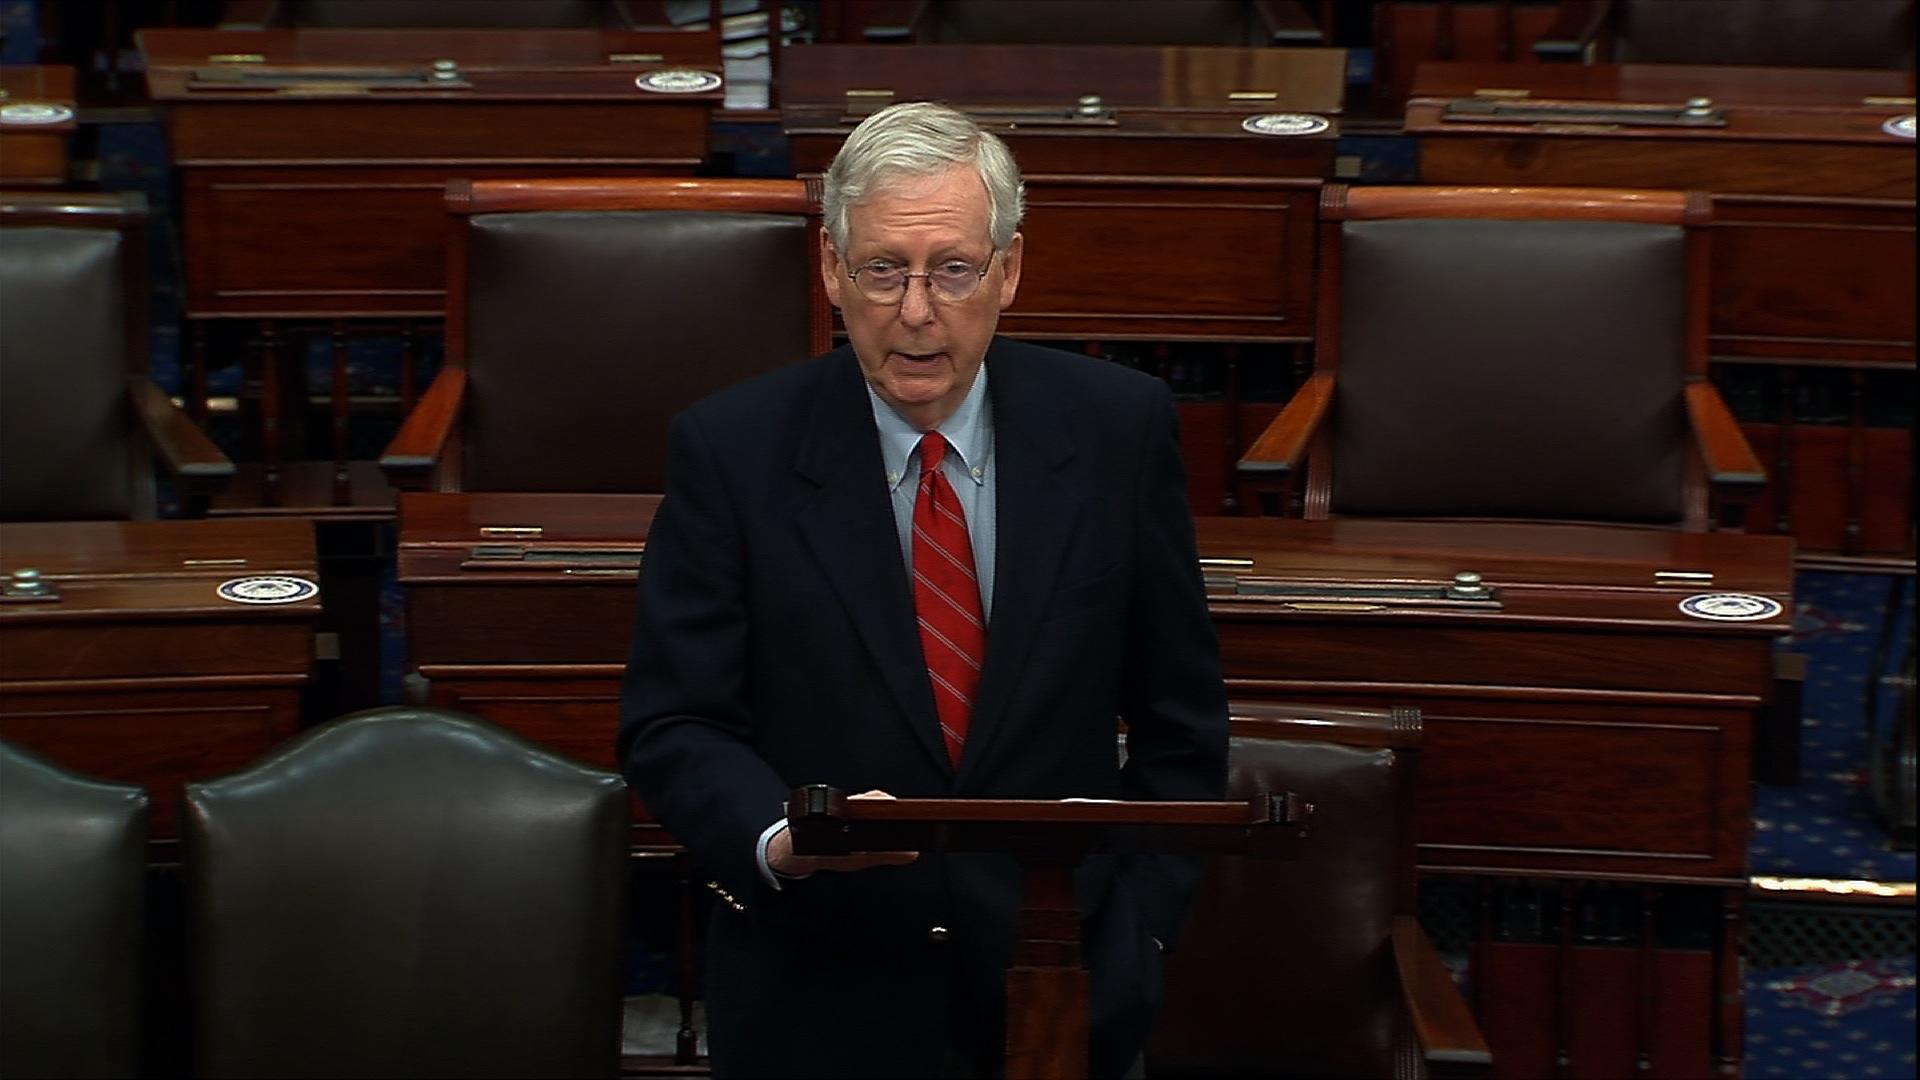 Senate Majority Leader Mitch McConnell speaks on the senate floor in Washington, DC, on November 9.